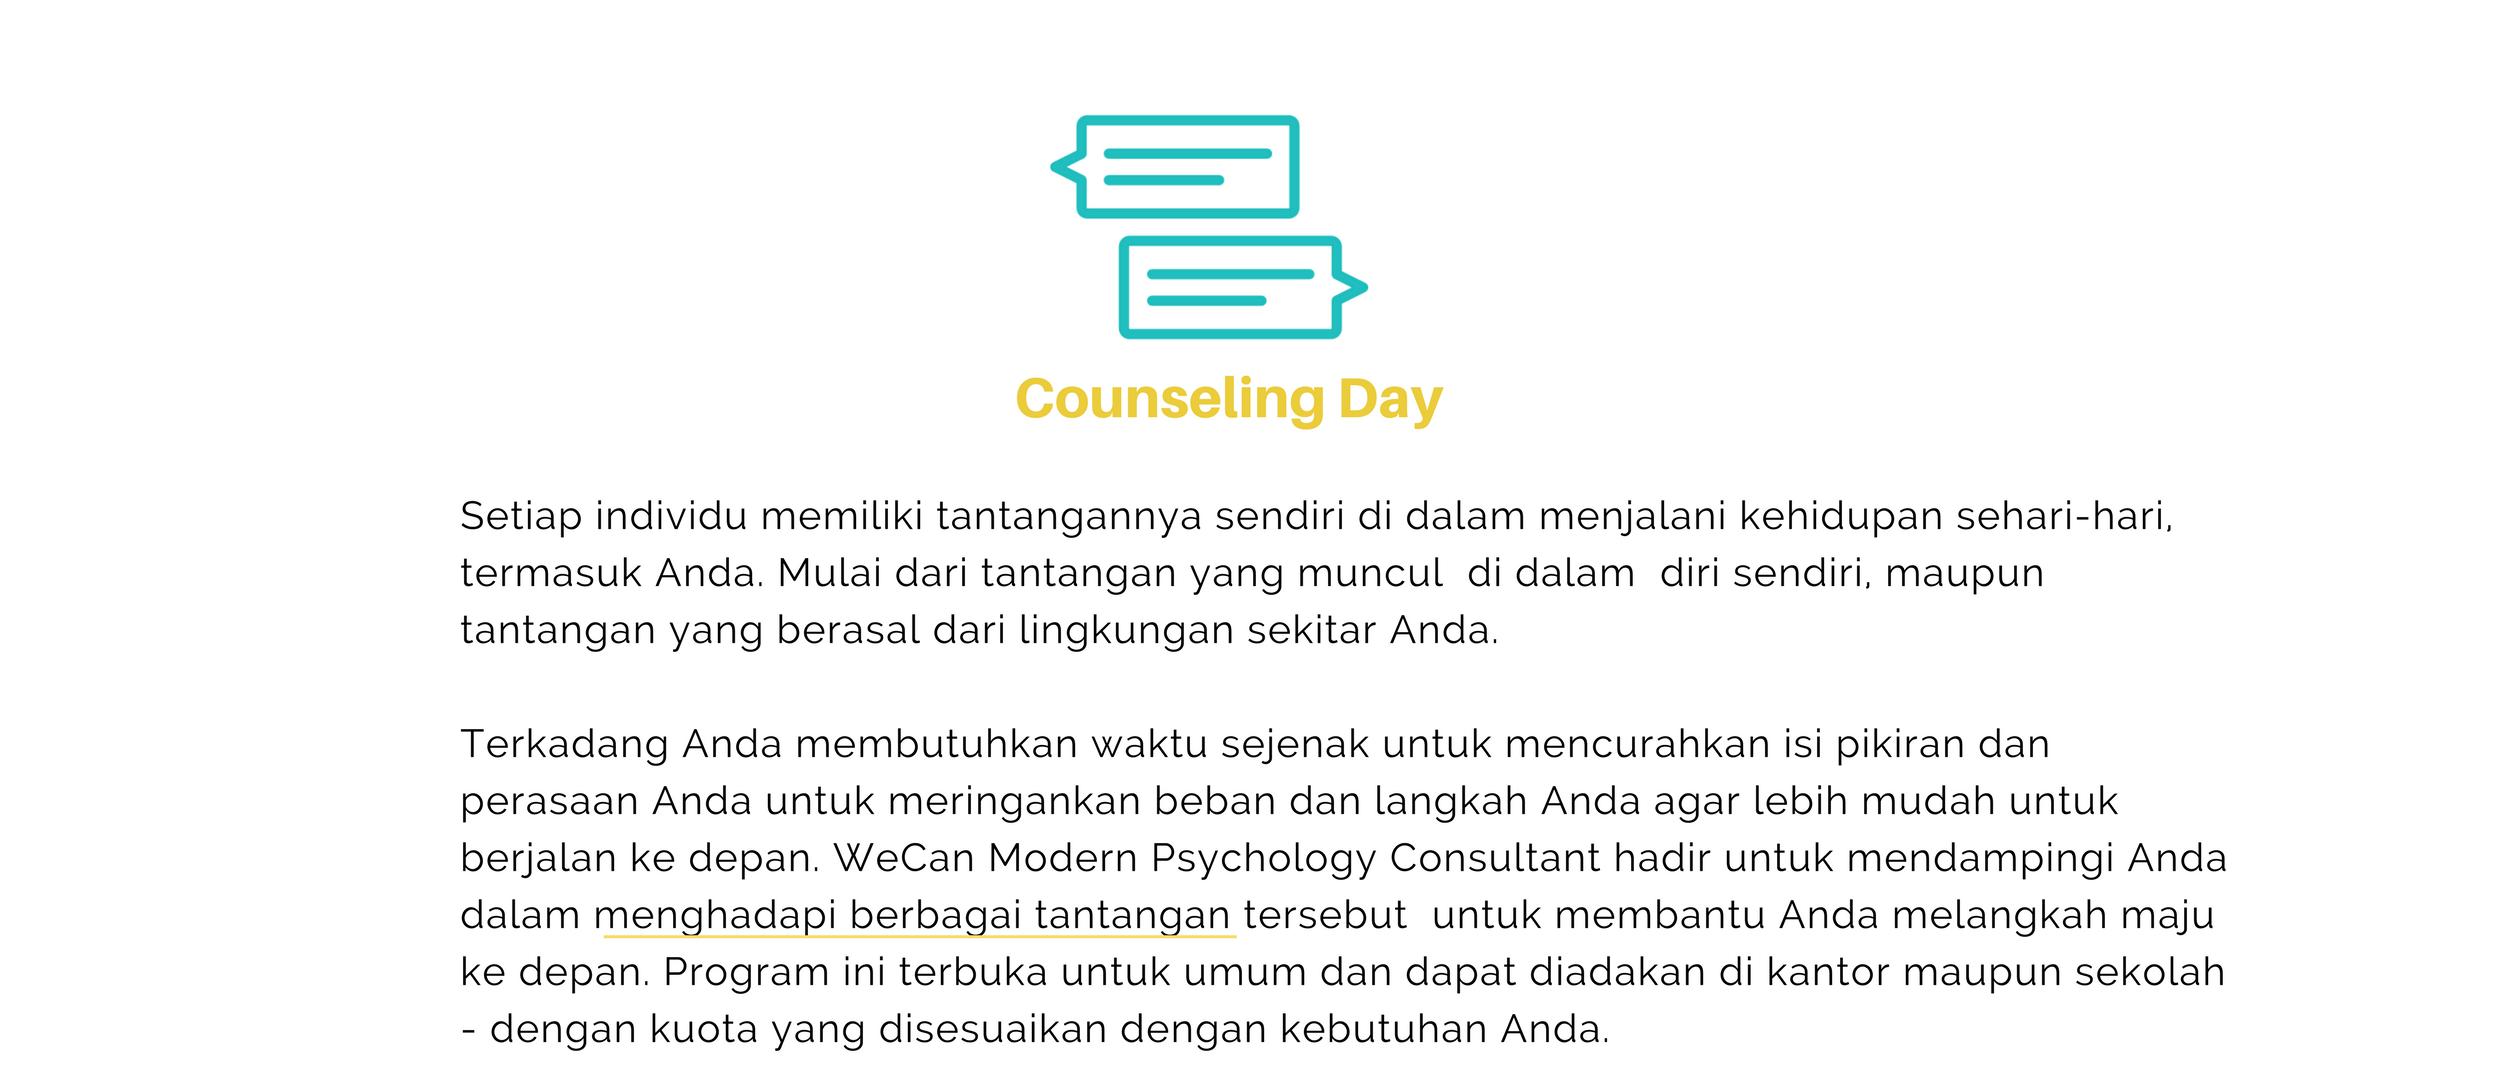 mengapa konseling_ (16).png